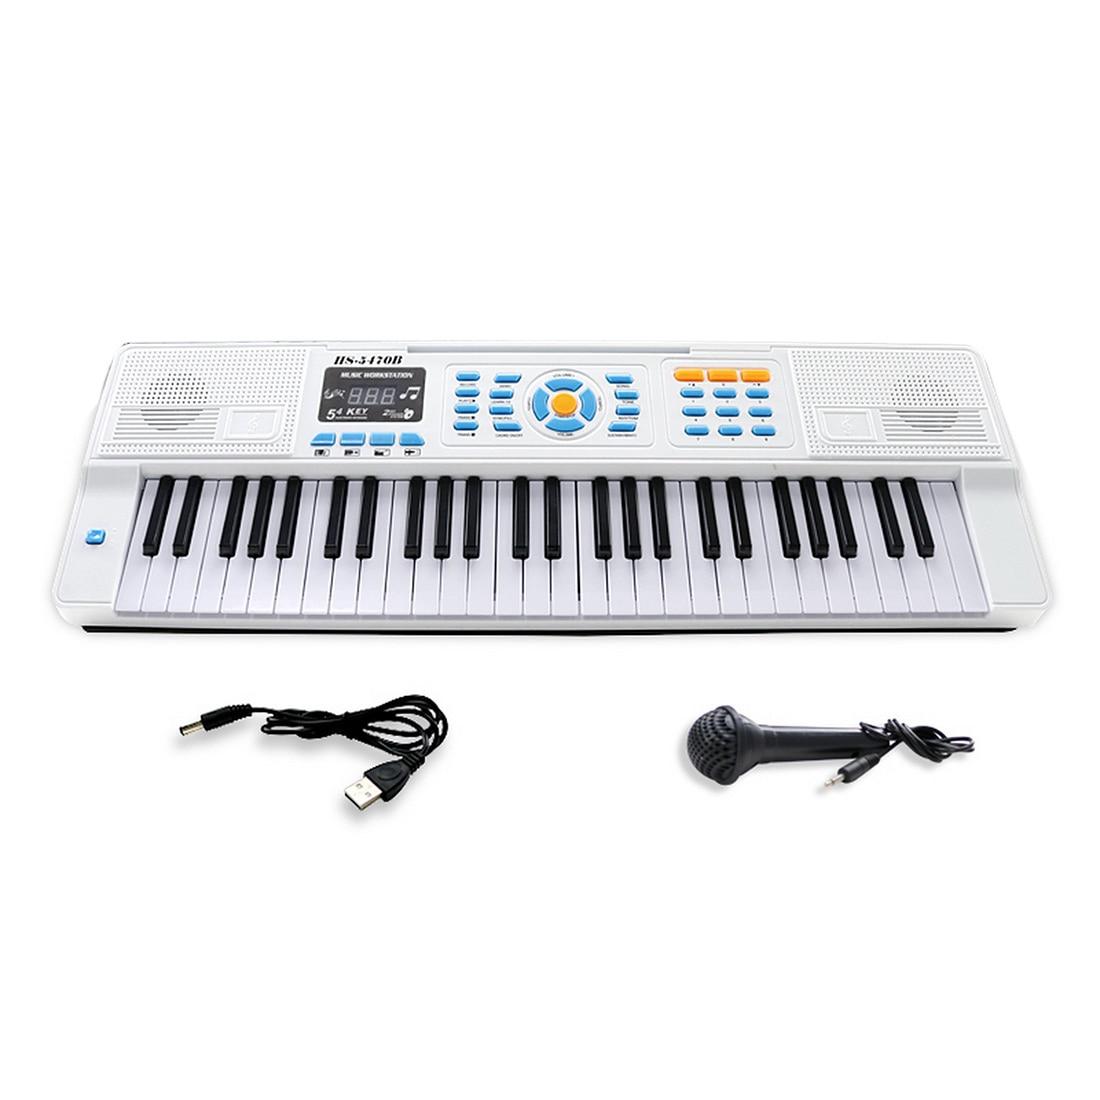 teclado eletrico multifuncional para criancas 54 teclas com display de led microfone